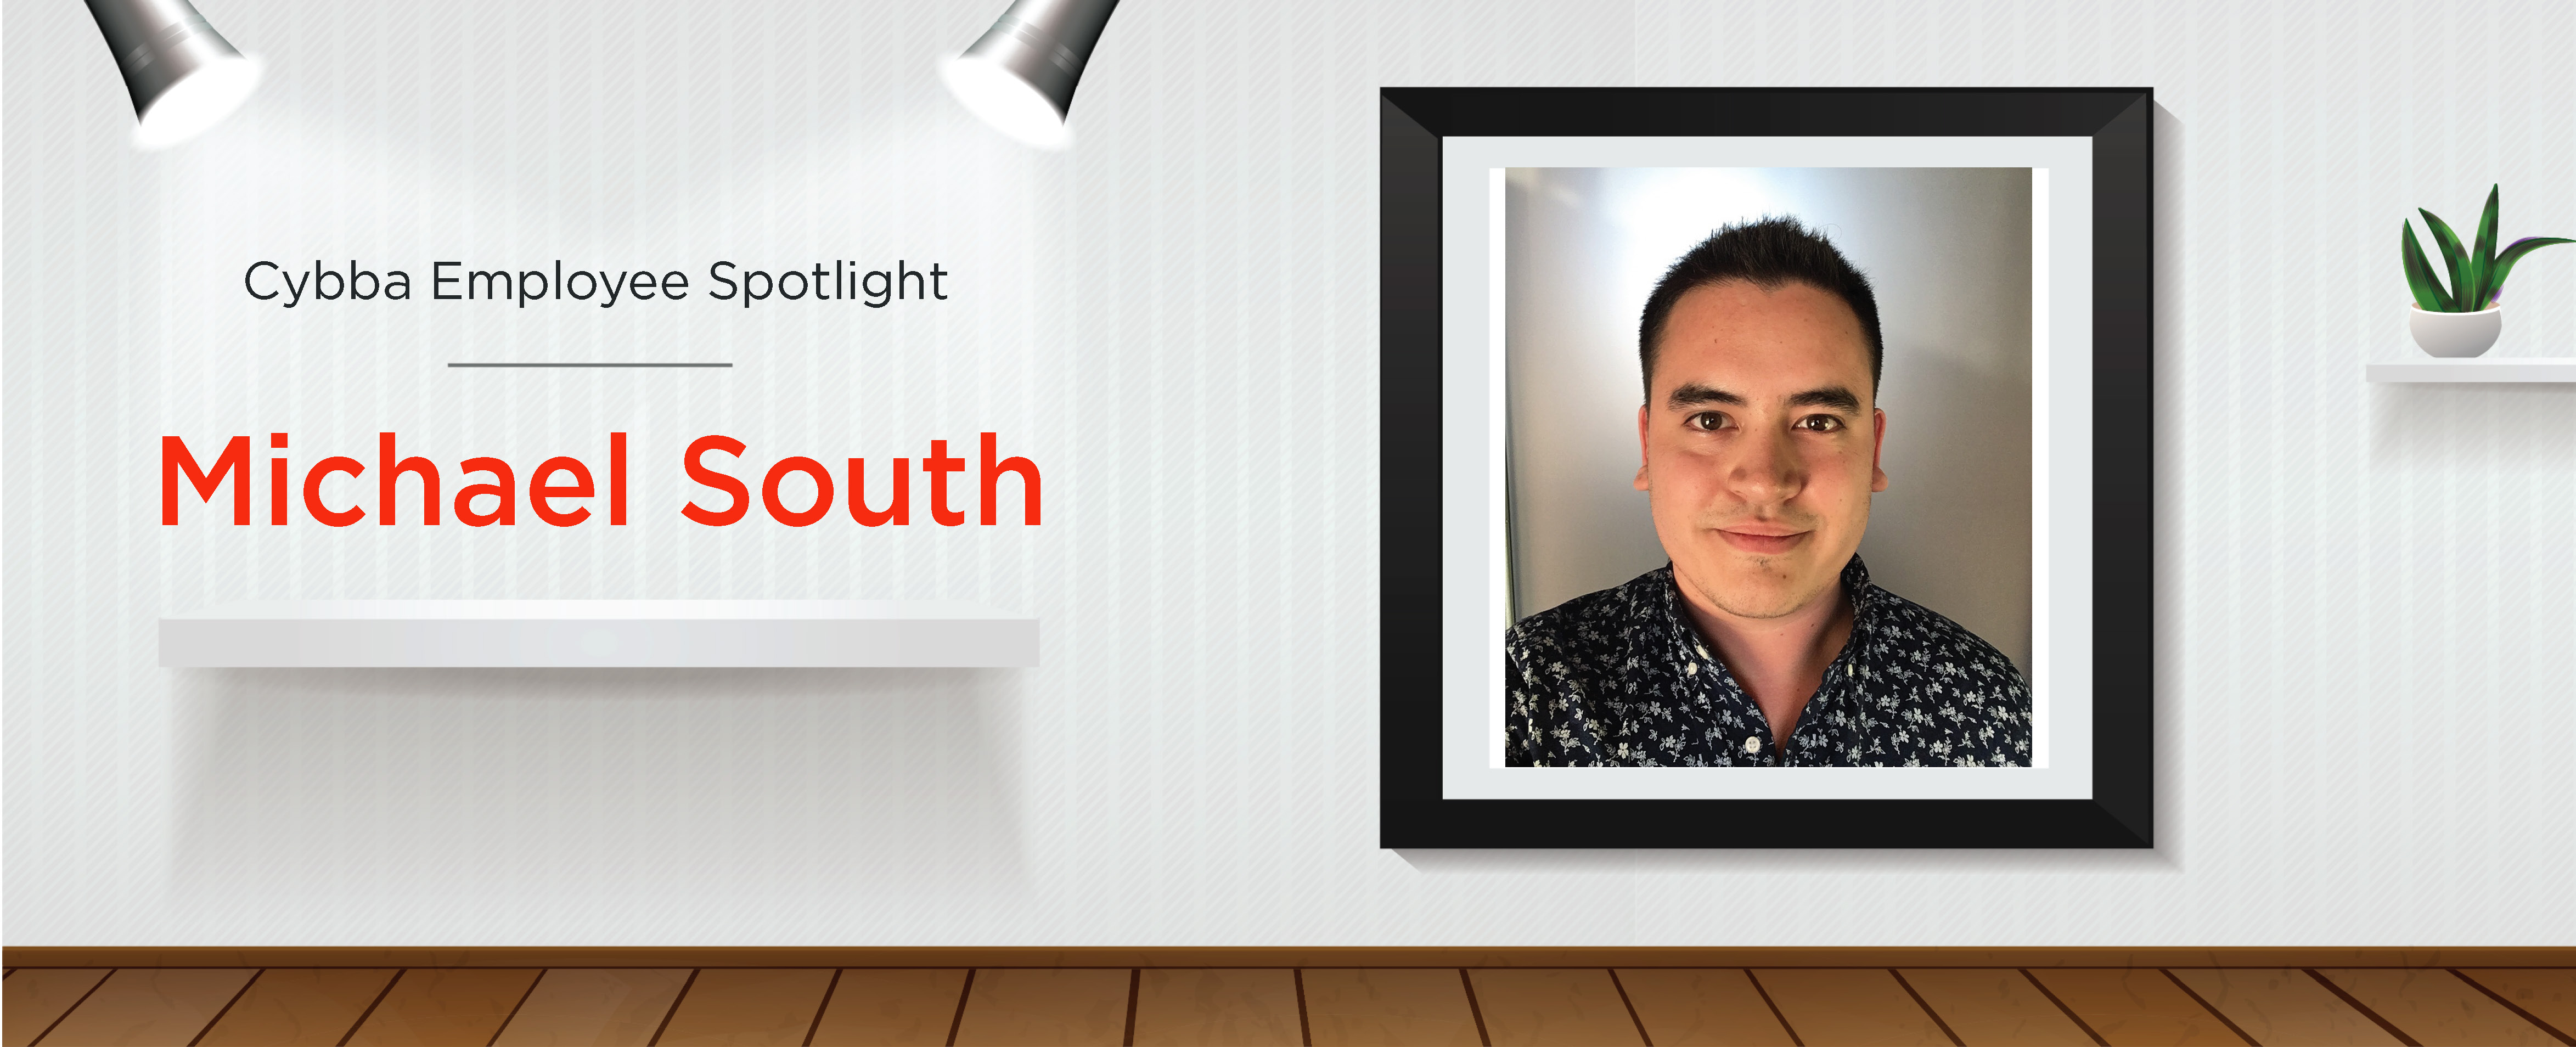 Michael South Spotlight